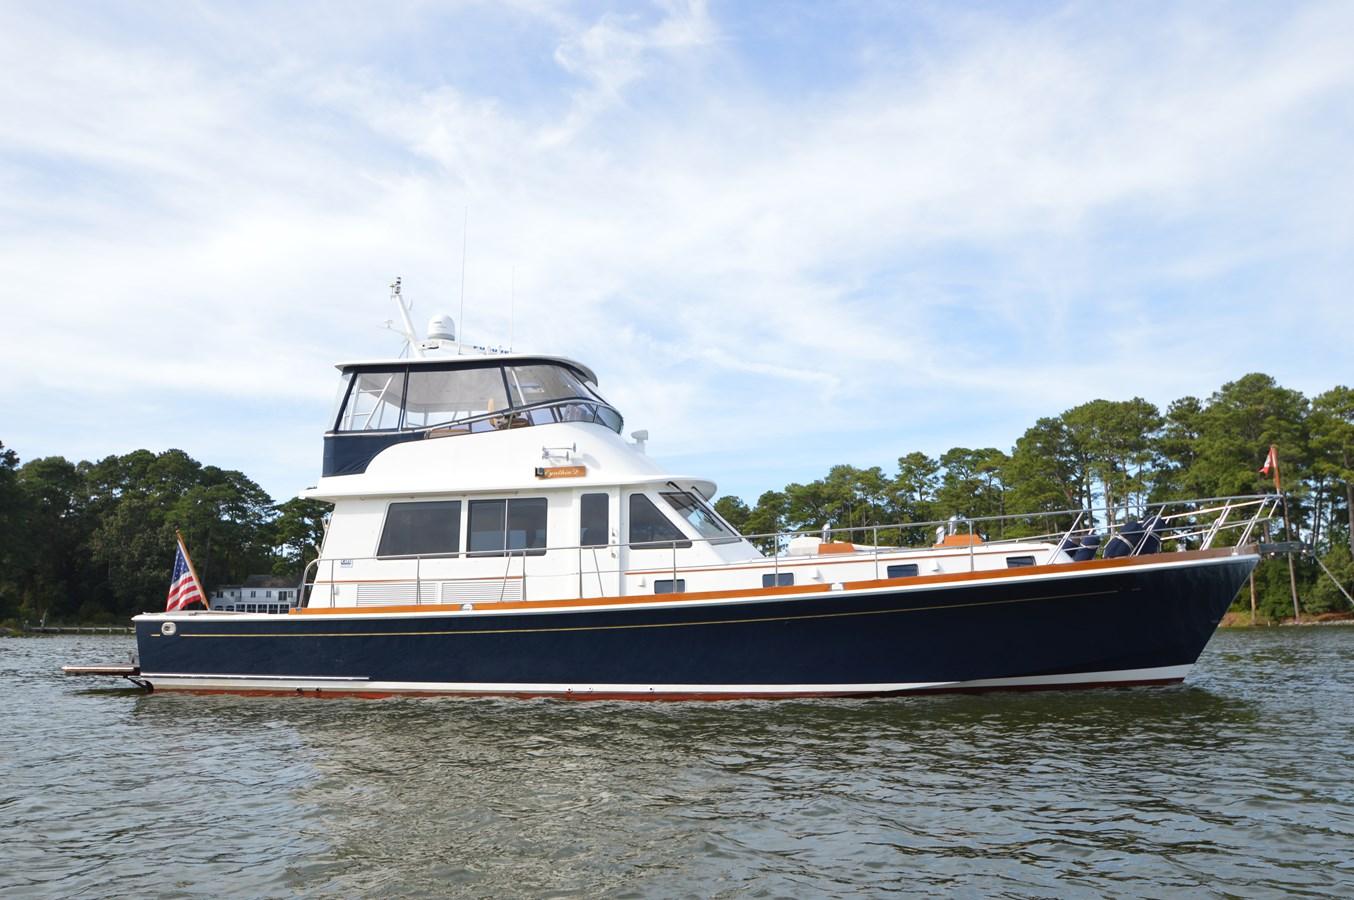 2 2004 GRAND BANKS 58 Eastbay Motor Yacht 2713344